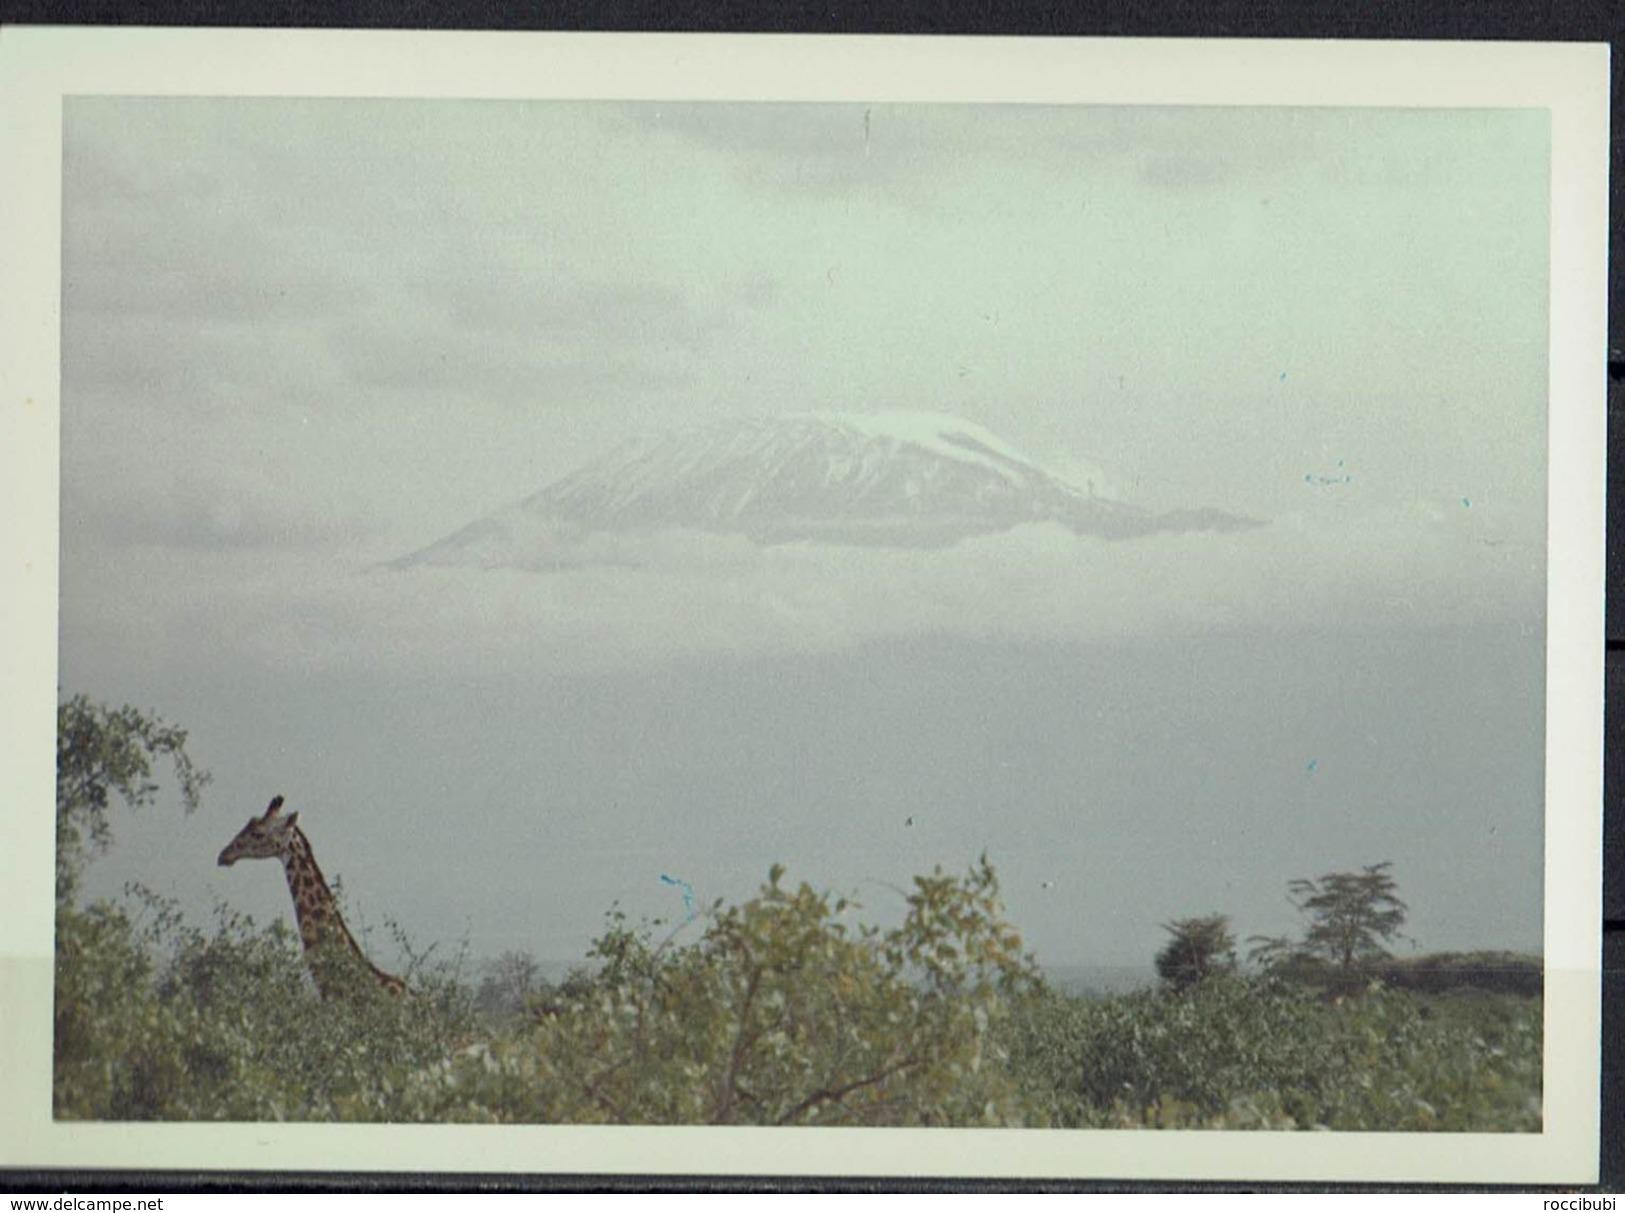 Afrika, Natur, Savanne, Giraffe Von Hobbyfotograf (20) - Afrika